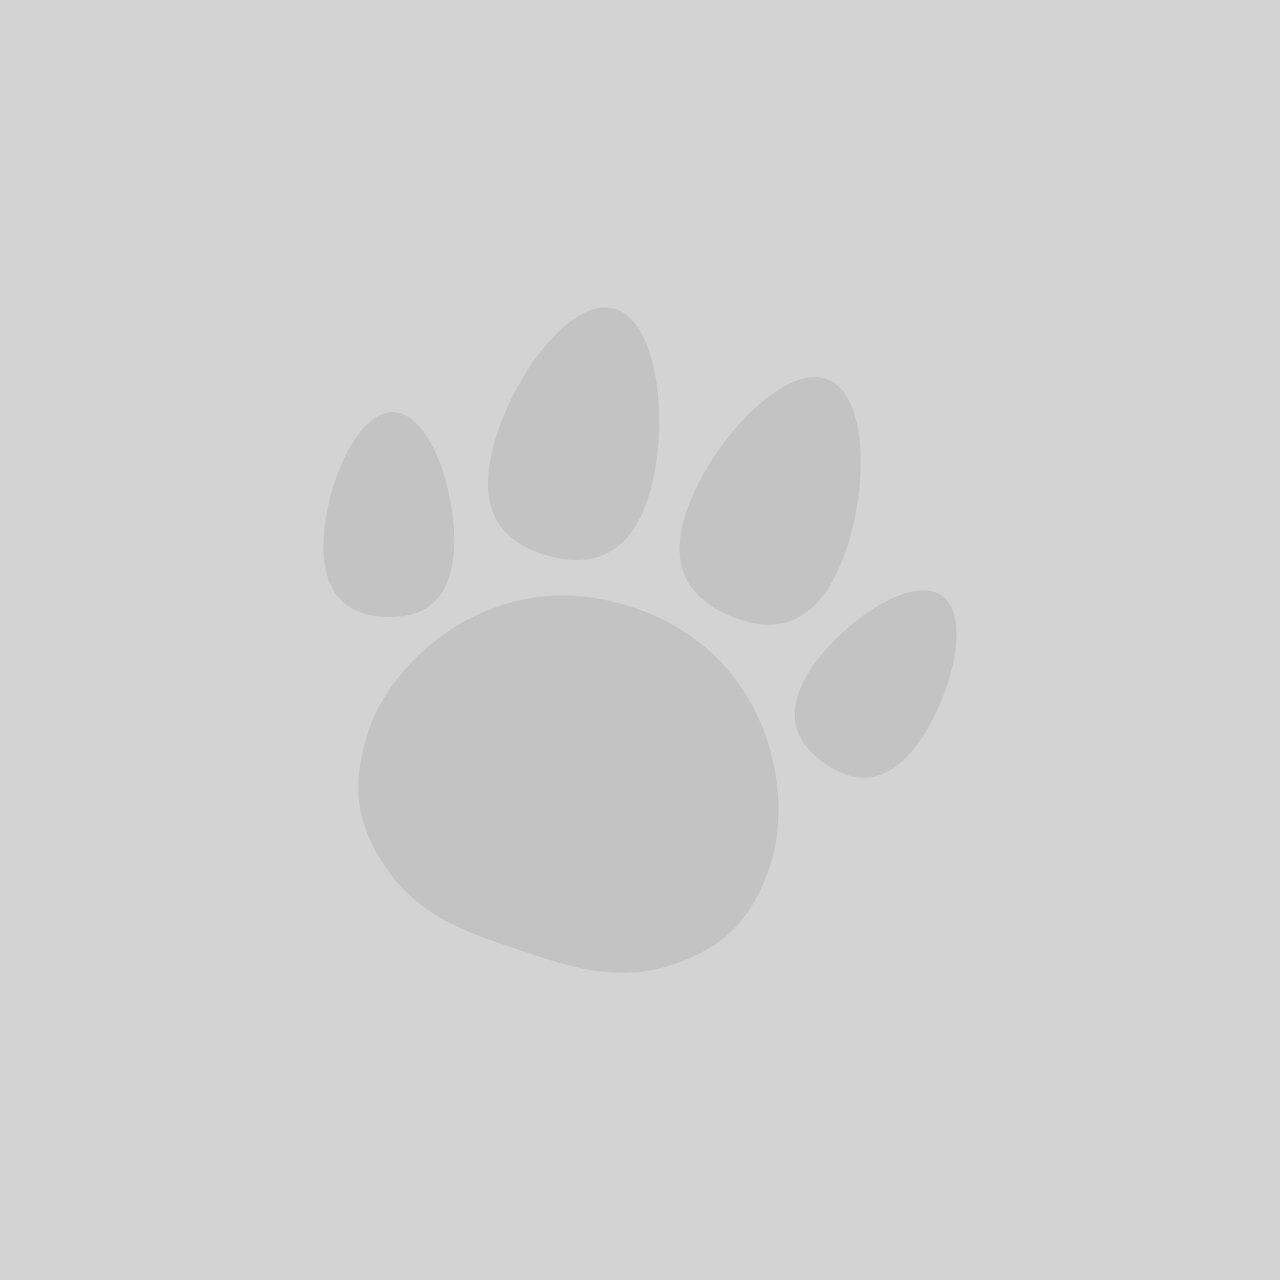 Ancol K9 Dog Cologne 100ml